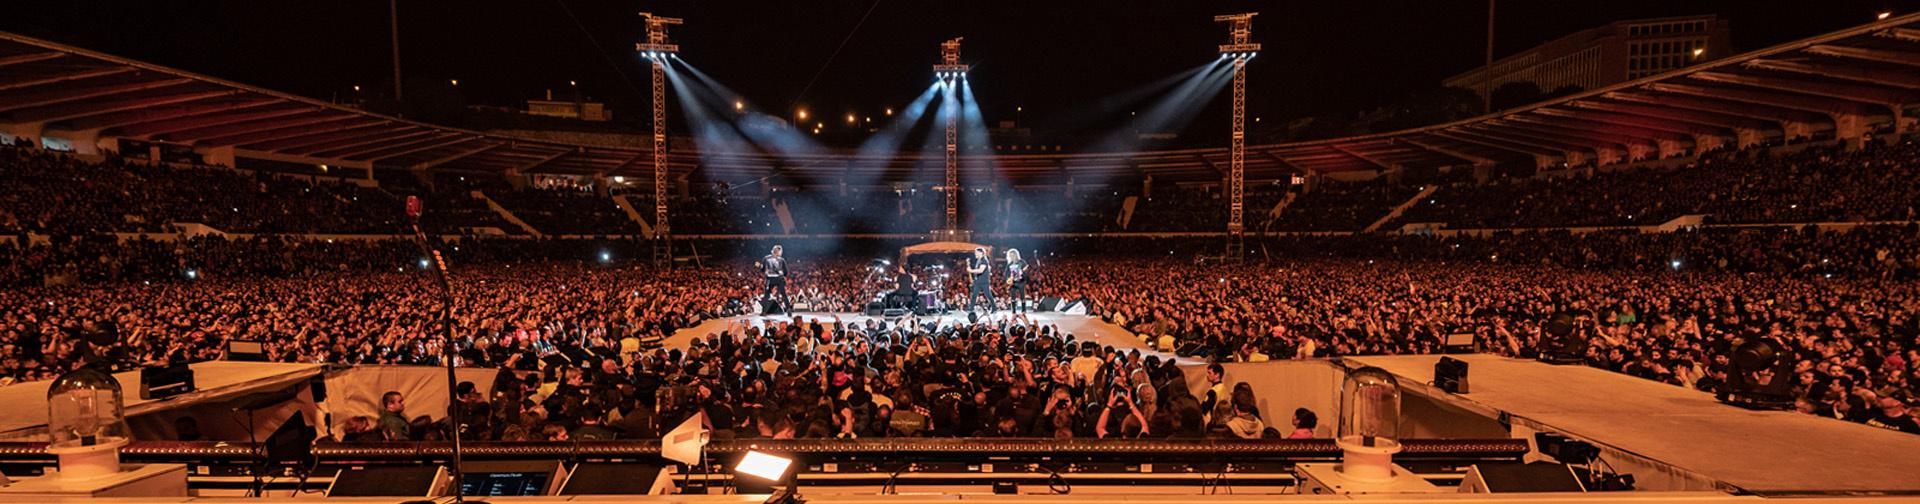 Metallica at Estádio do Restelo in Lisbon, Portugal on May 1